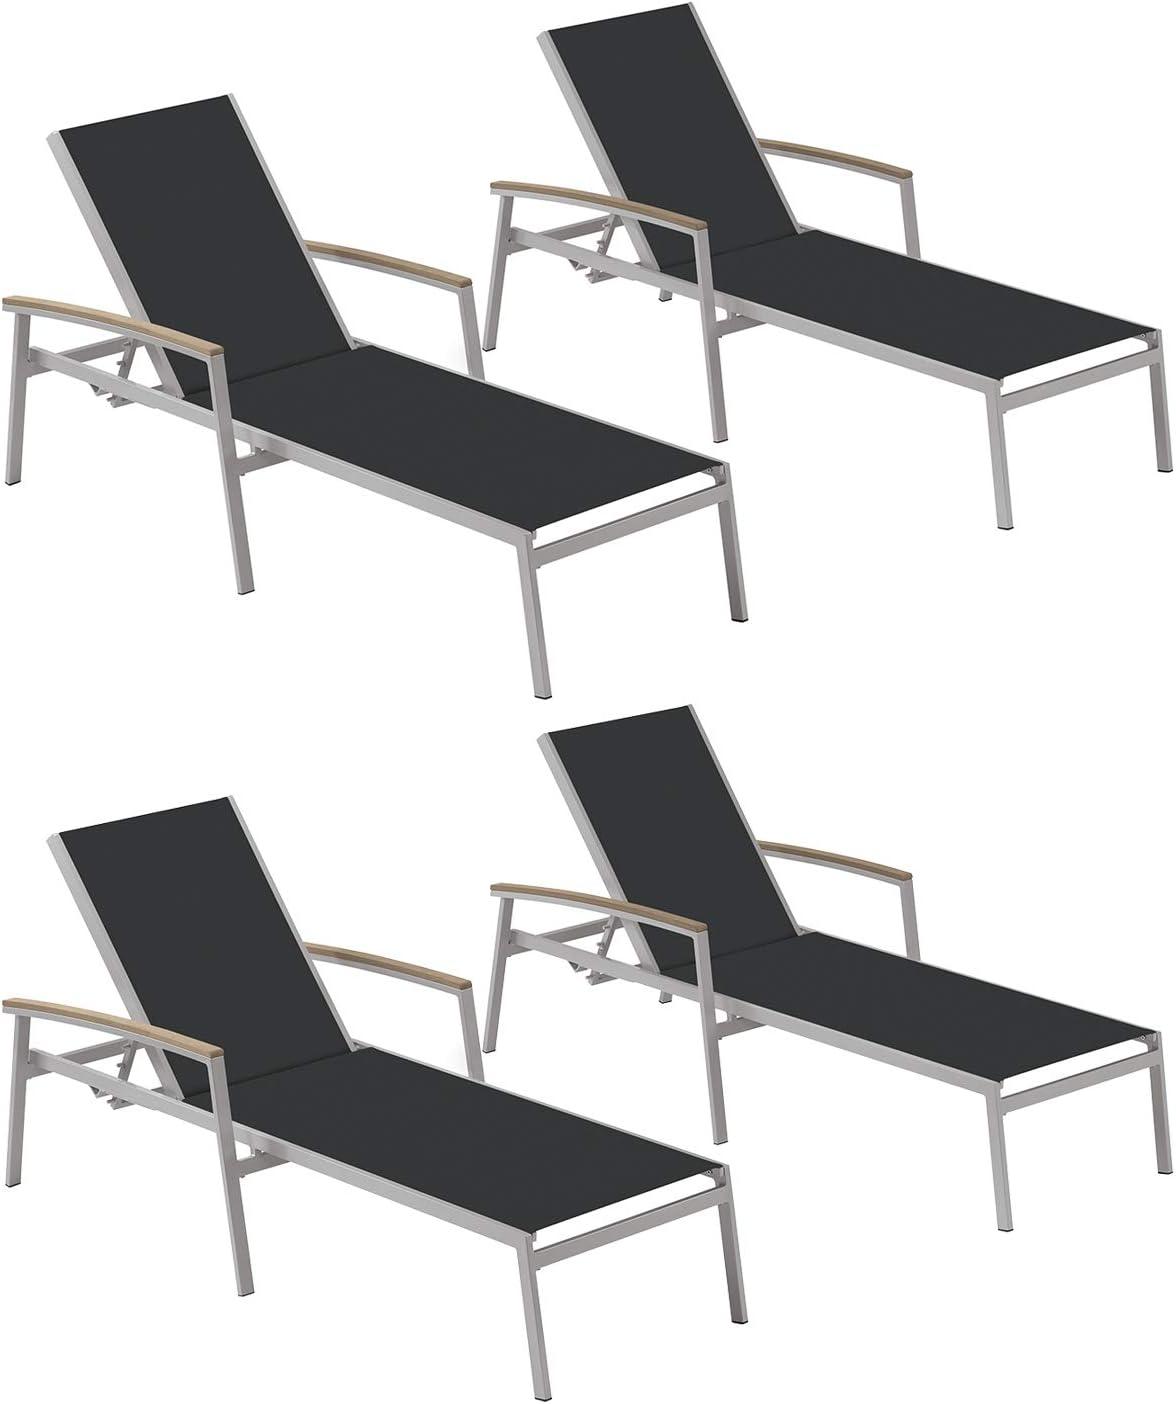 Oxford Garden Travira TVL80BV4 Chaise Lounge - Black Sling - Vintage Tekwood Armcaps - Set of 4